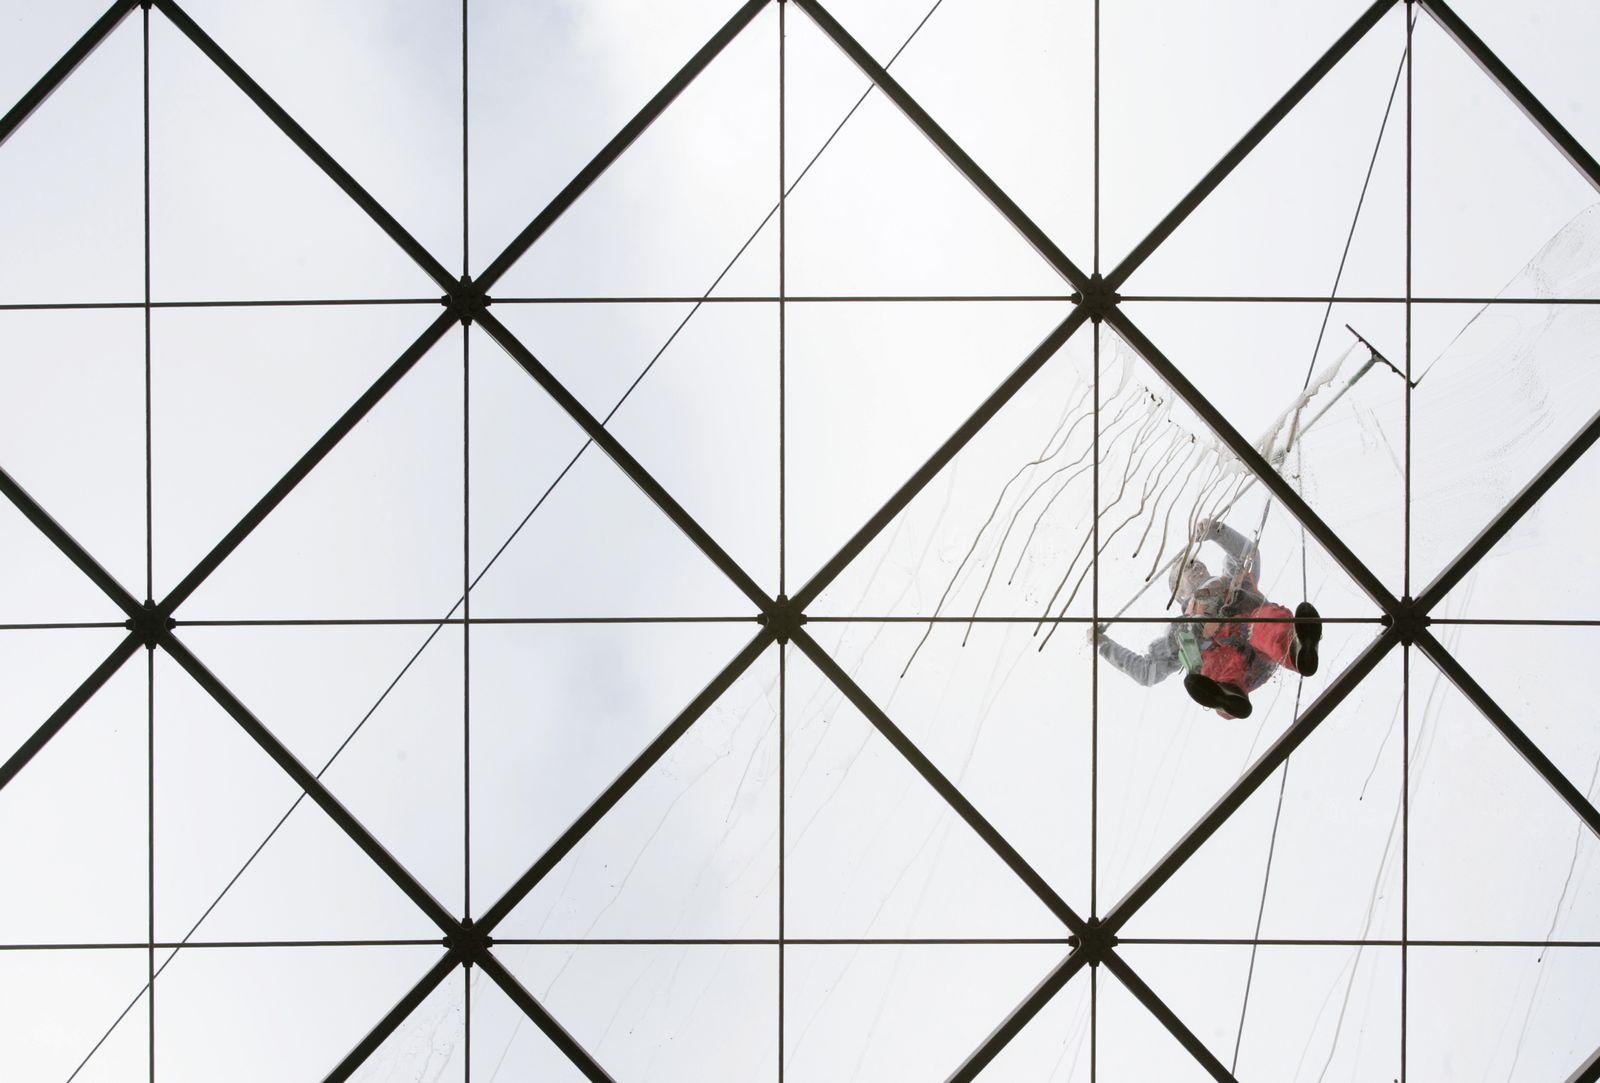 Mindestlohn/ Niedriglohn/ Fensterputzer